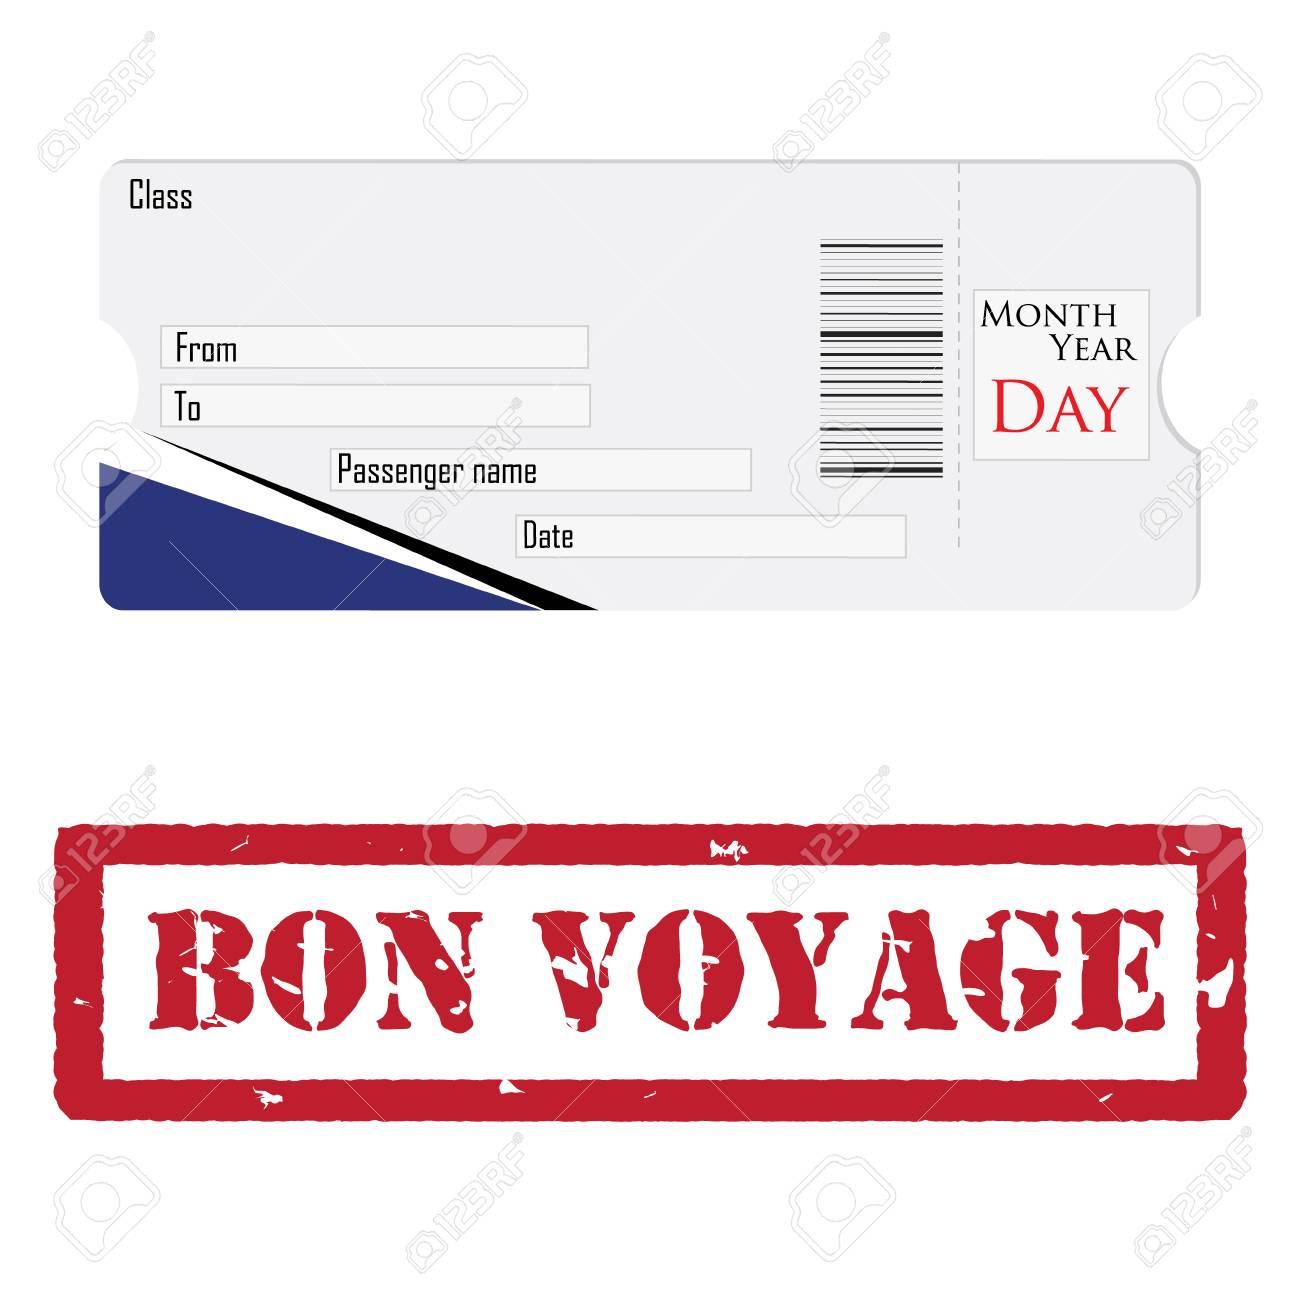 Erfreut Leere Flugzeug Ticketvorlage Fotos - Entry Level Resume ...